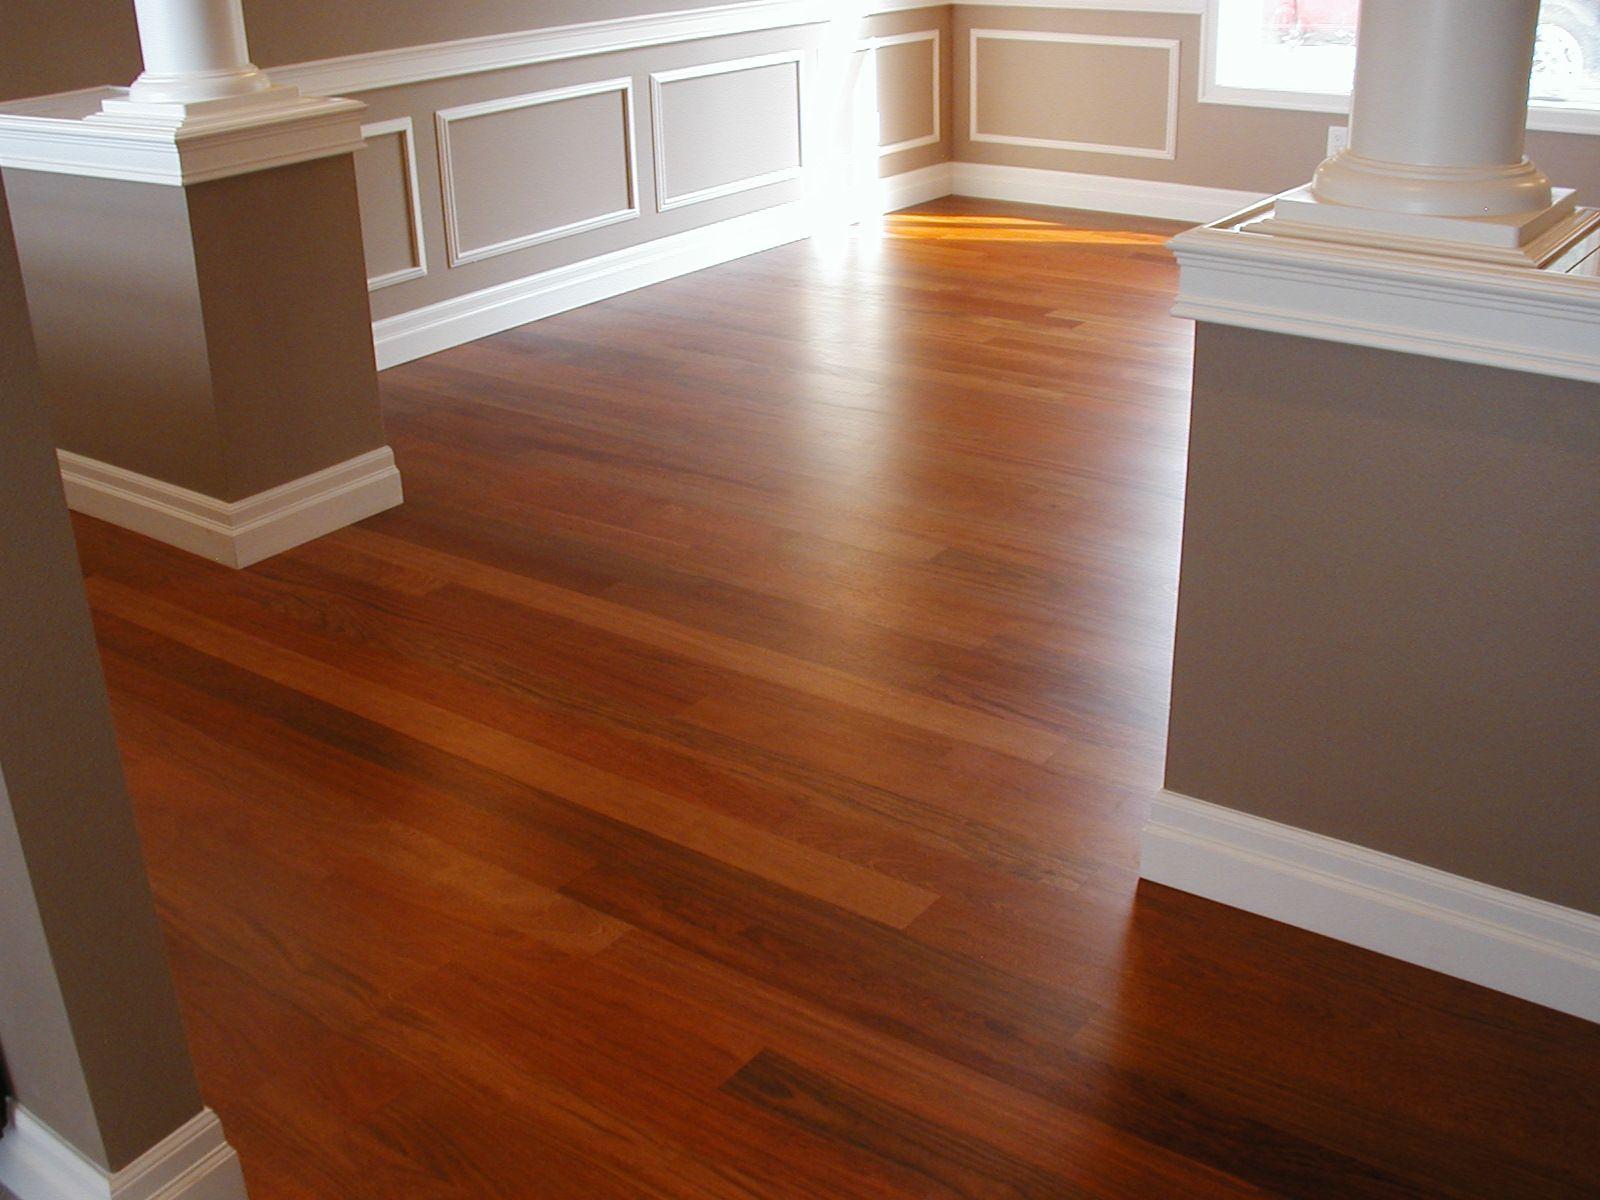 brazilian cherry floors in kitchen  Help choosing harwood